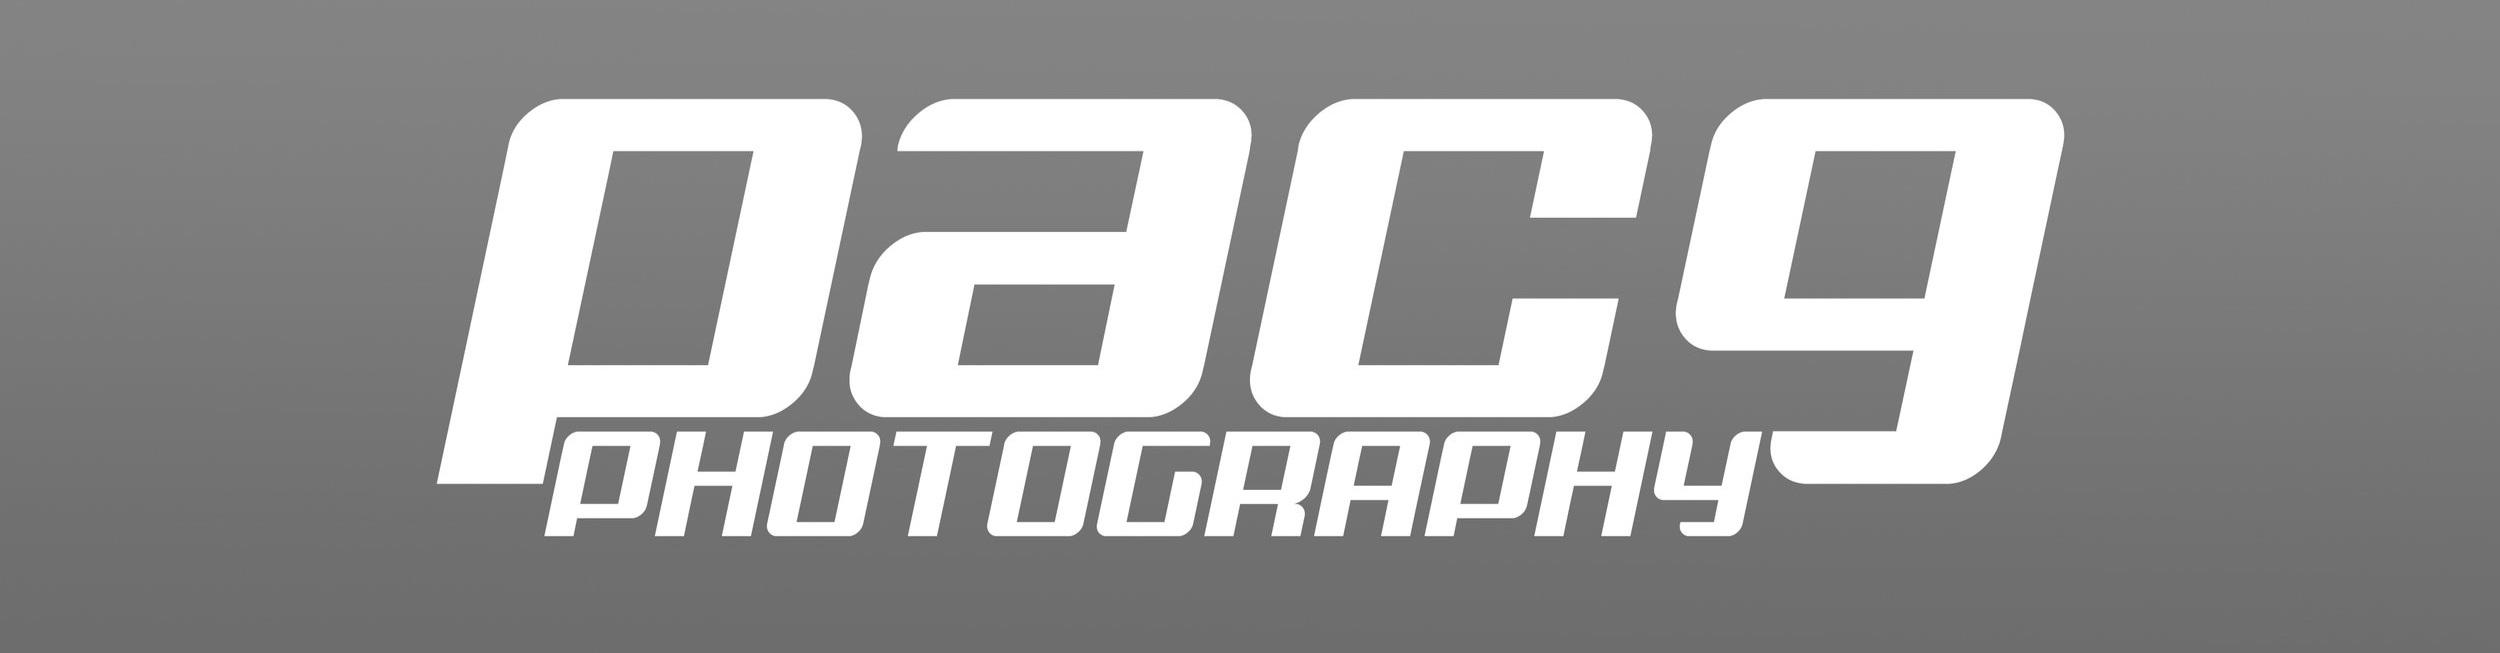 Base+Logo+White+on+Grey.jpg